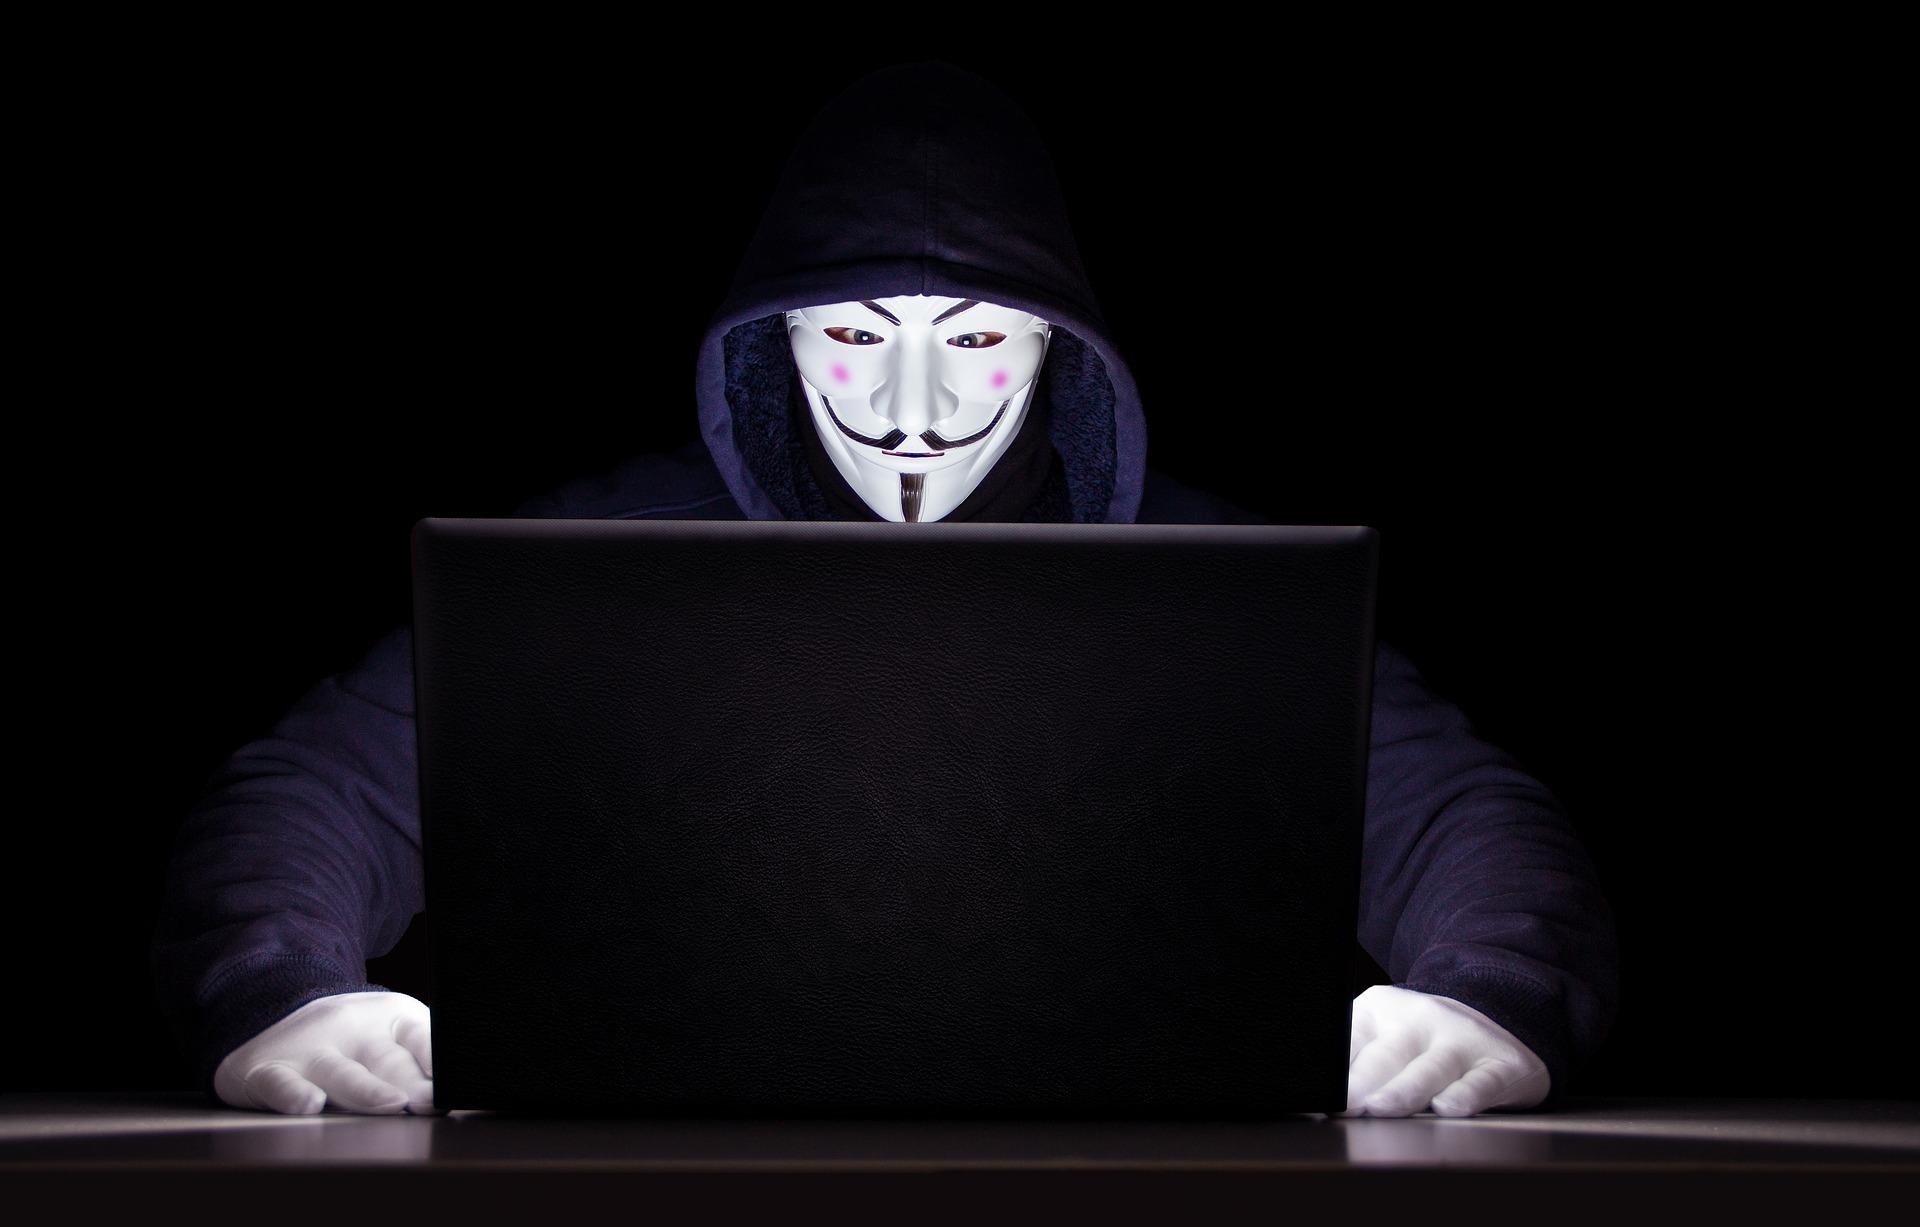 anonymous-4165613_1920.jpg